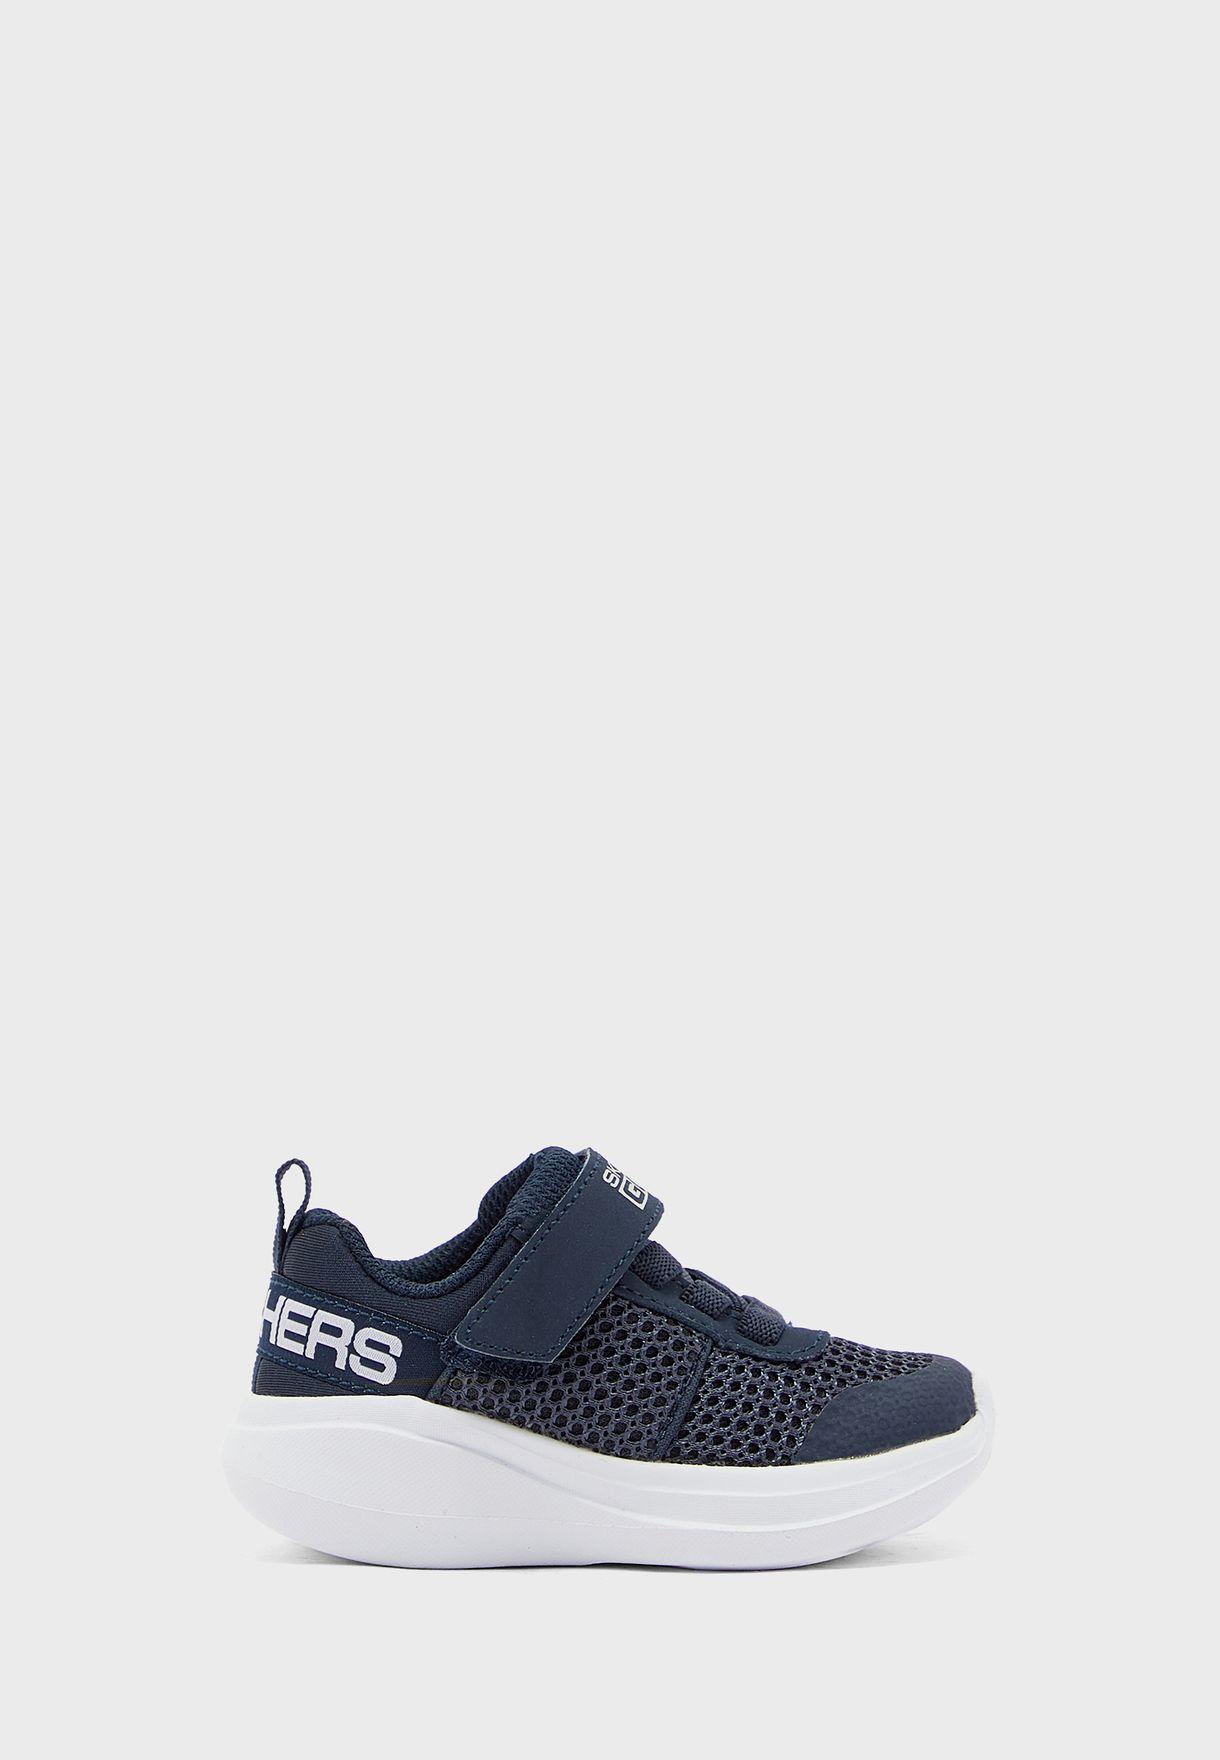 حذاء جو رن فاست للبيبي